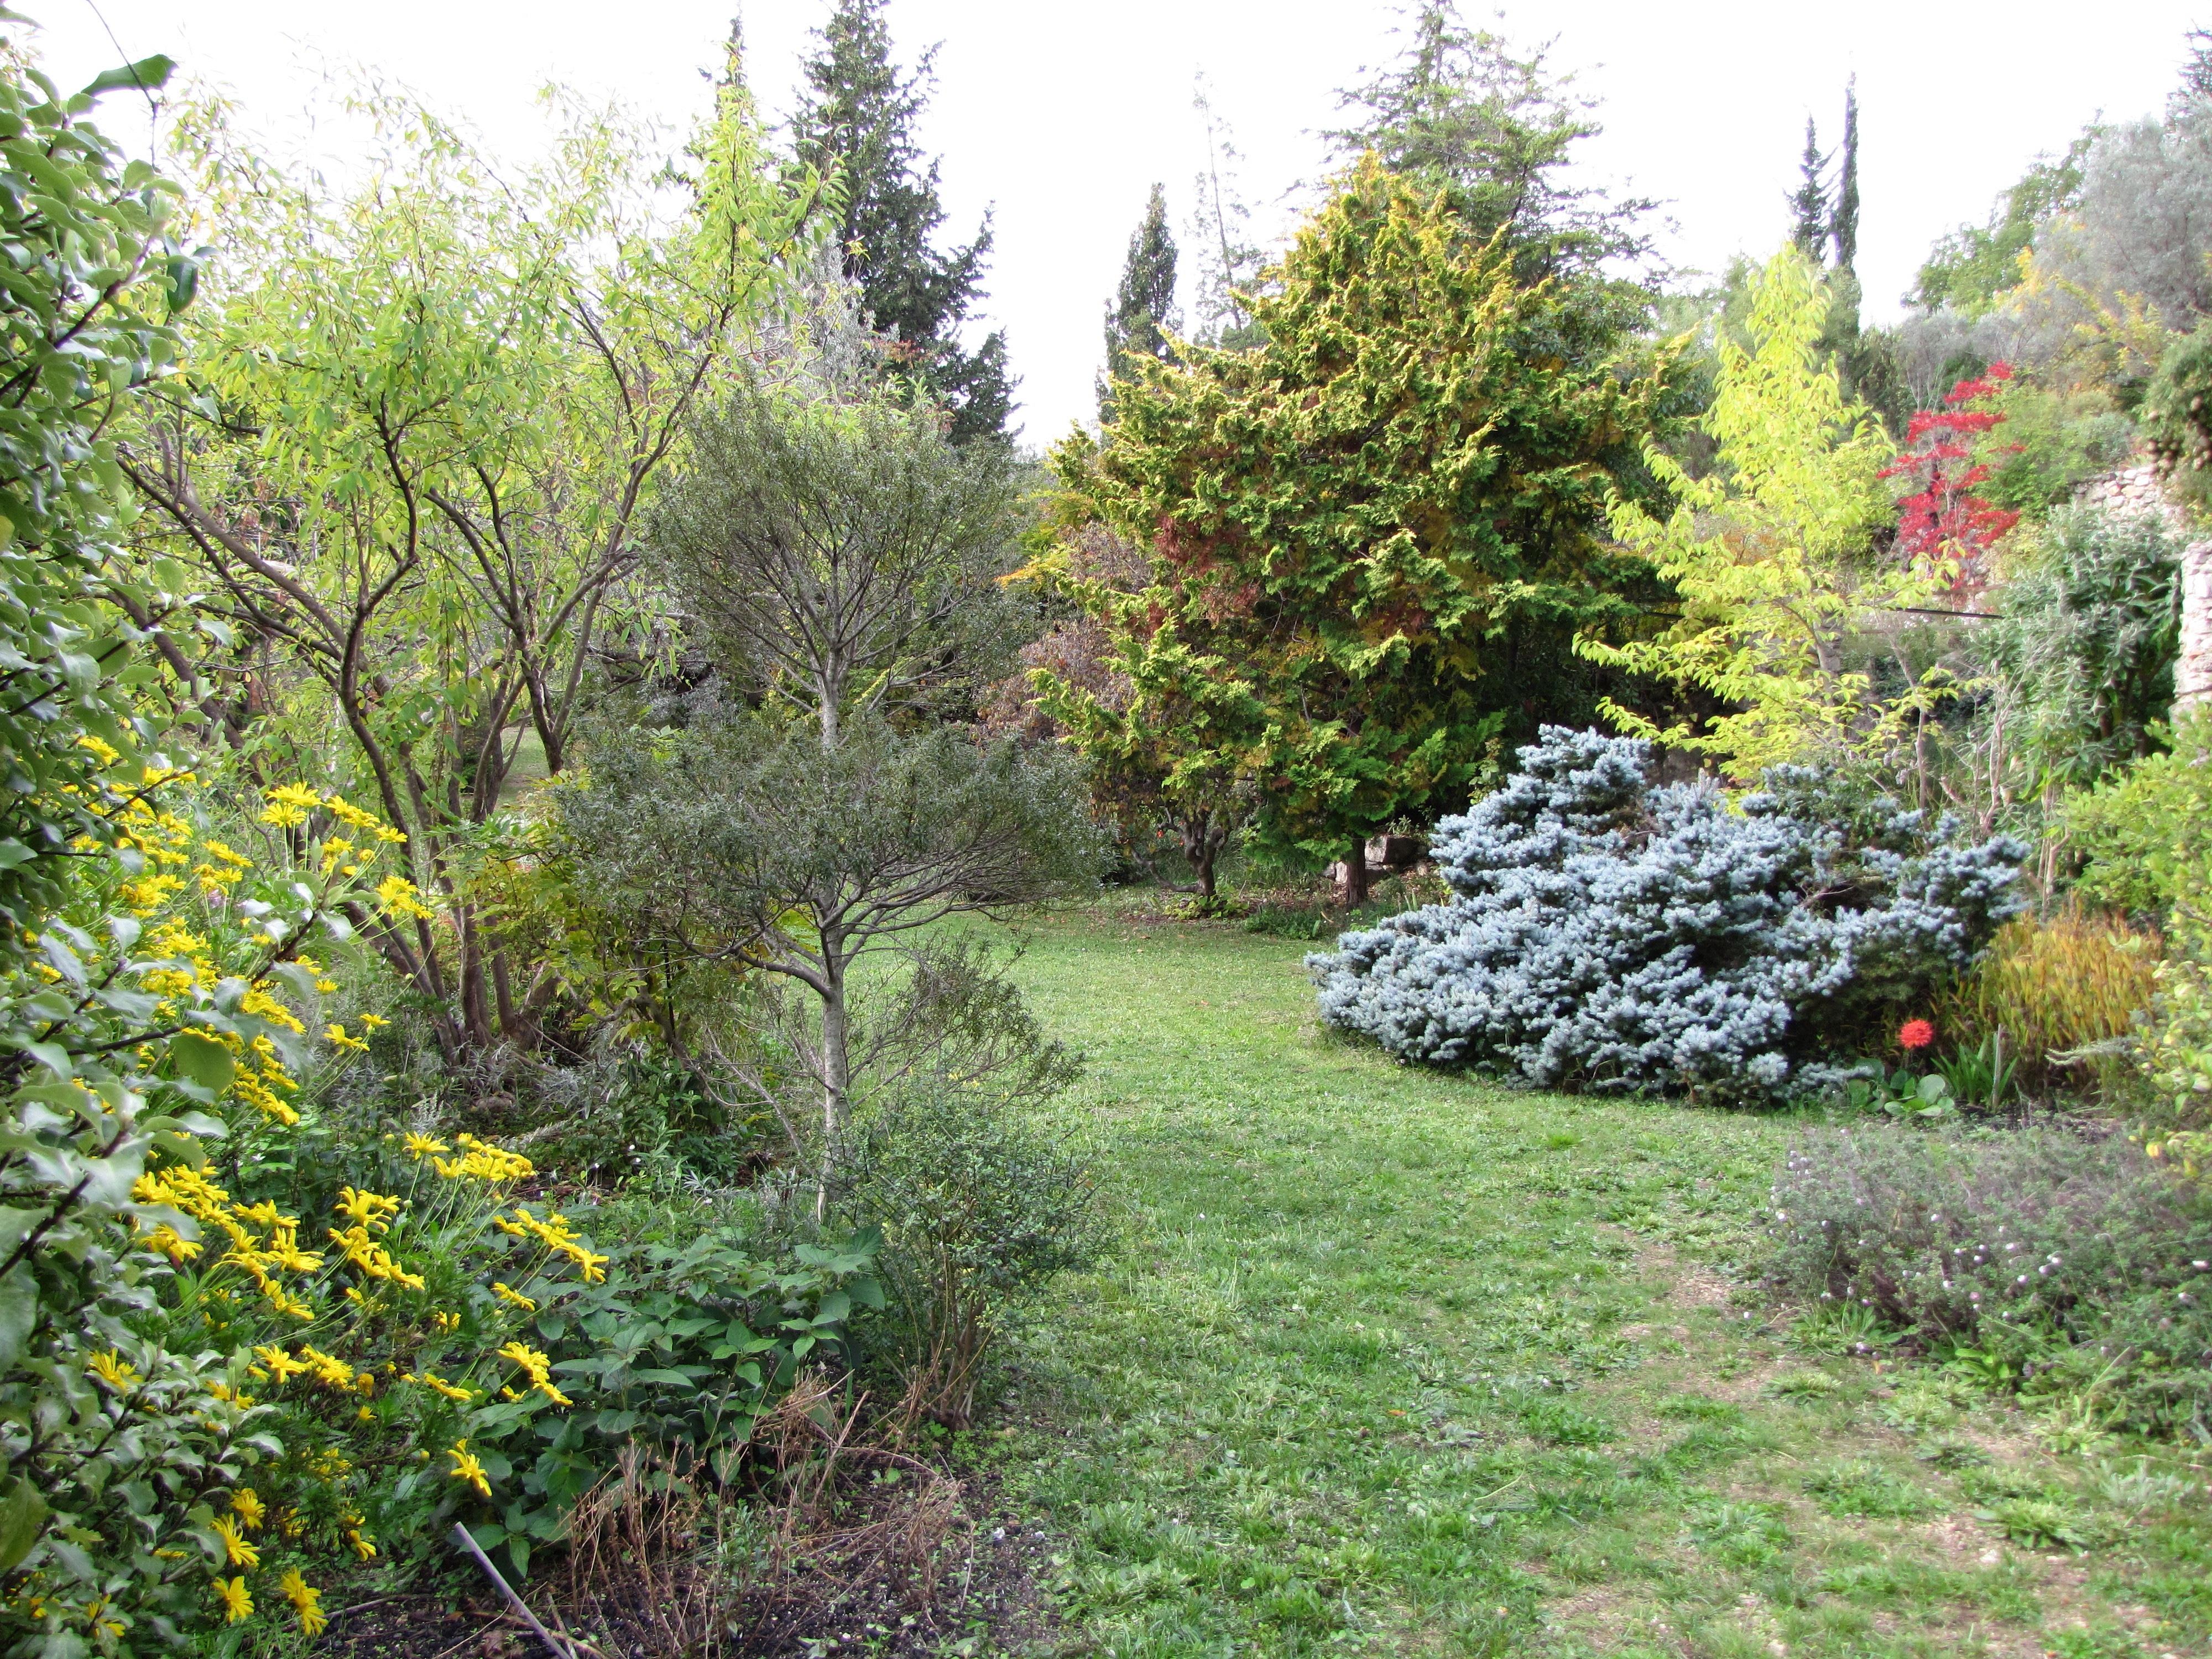 jardin de pierre cuche parcs et jardins paca